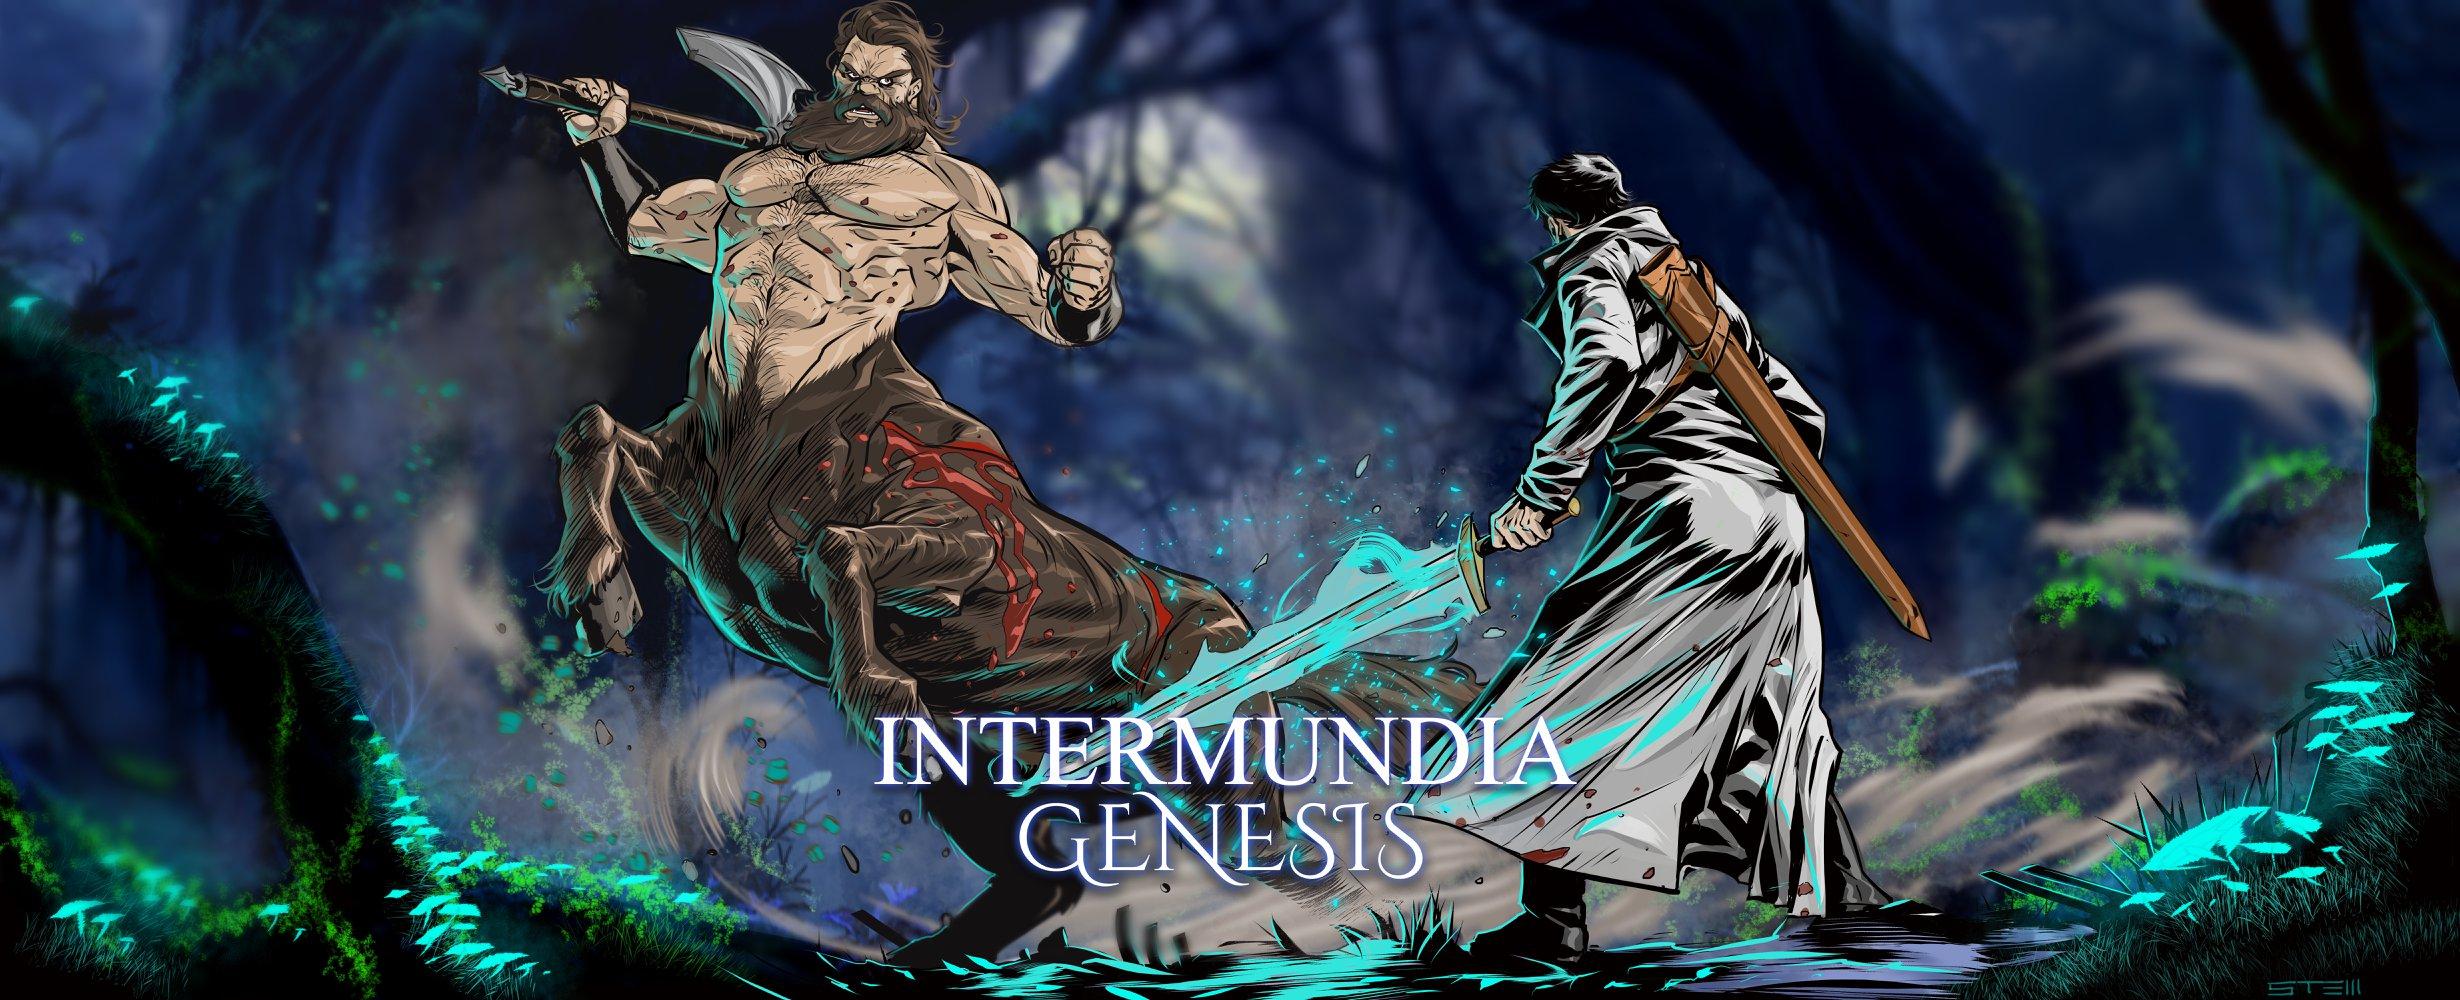 Intermundia Genesis: intervista a Giorgio Catania thumbnail